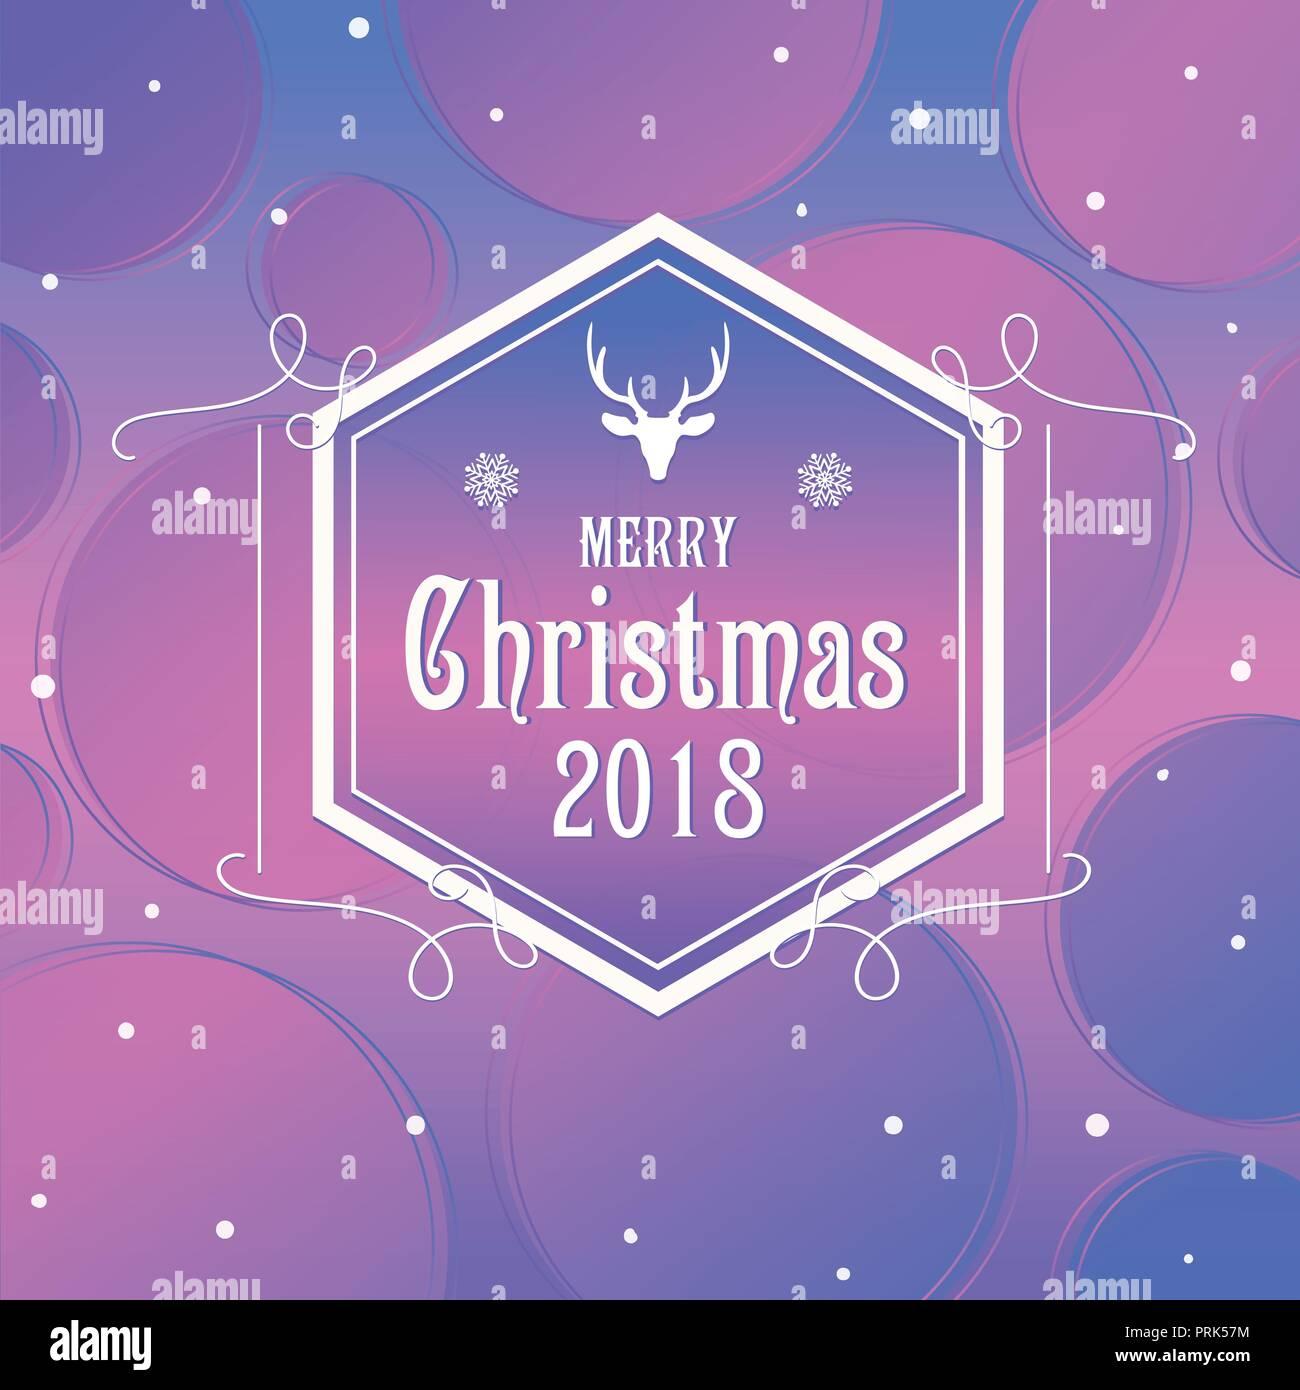 Merry Christmas Poster 2018.Merry Christmas Poster Design Vector Illustration Stock